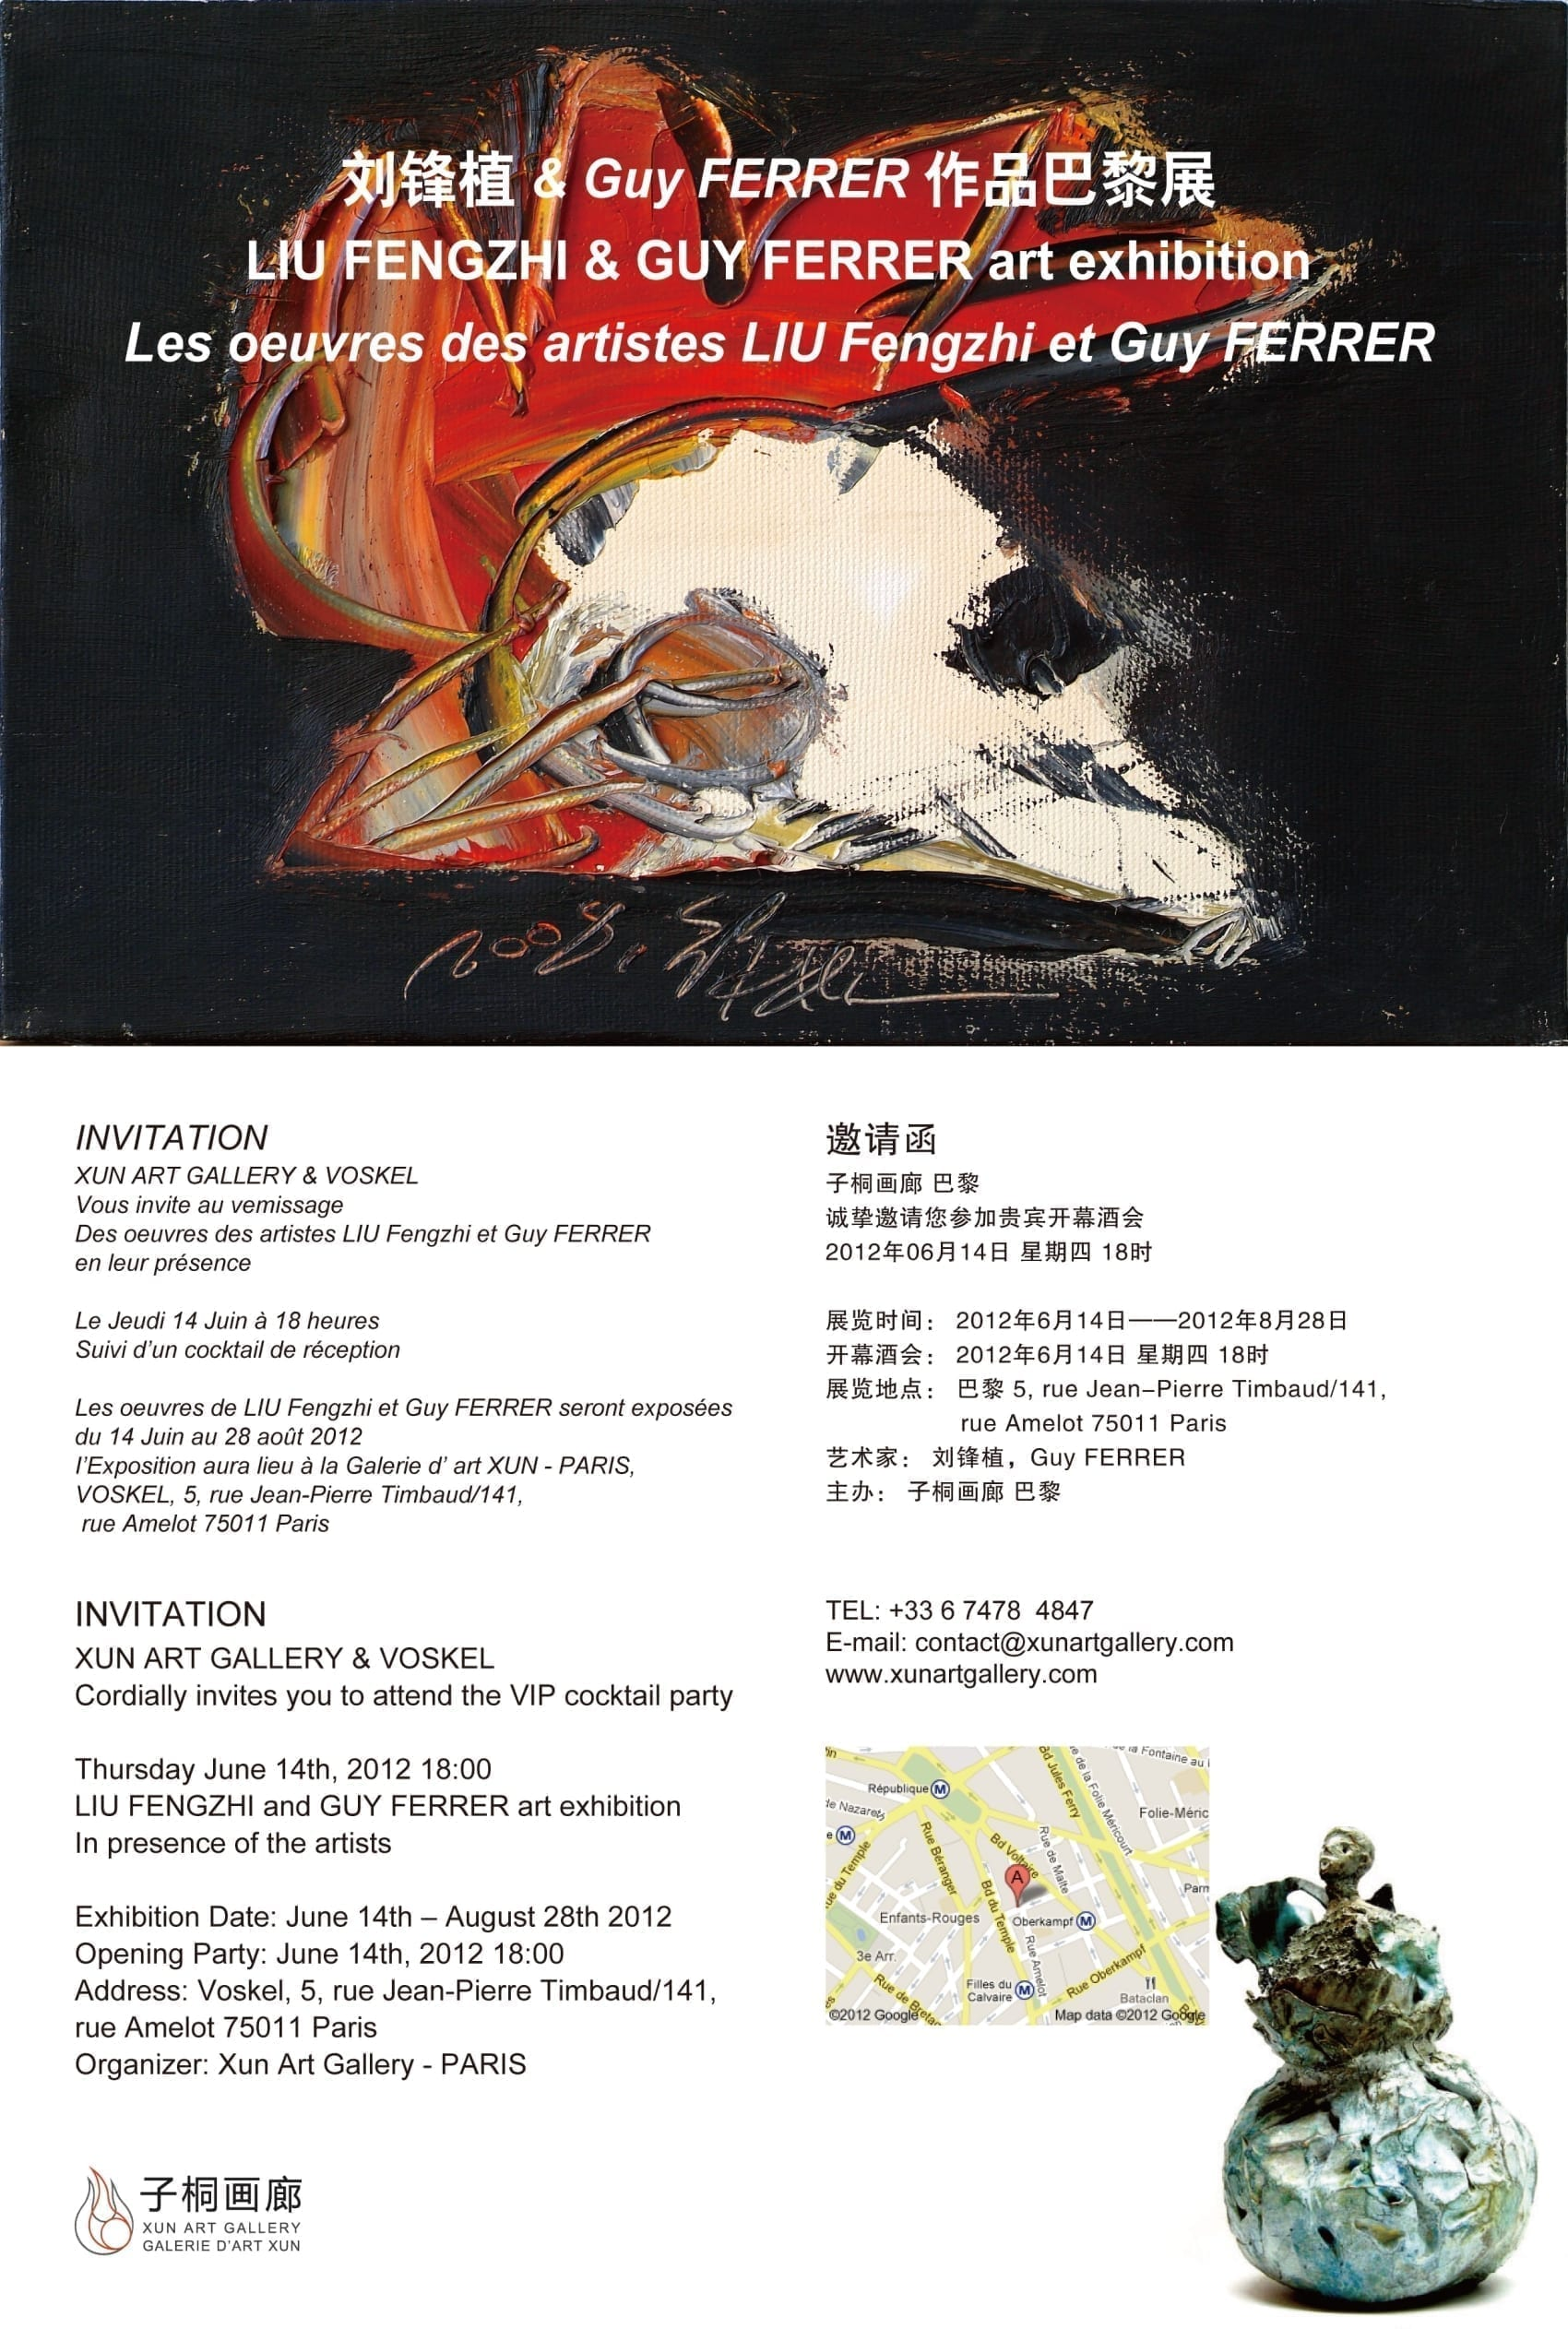 Invitation LIU FENGZHI and GUY FERRER art